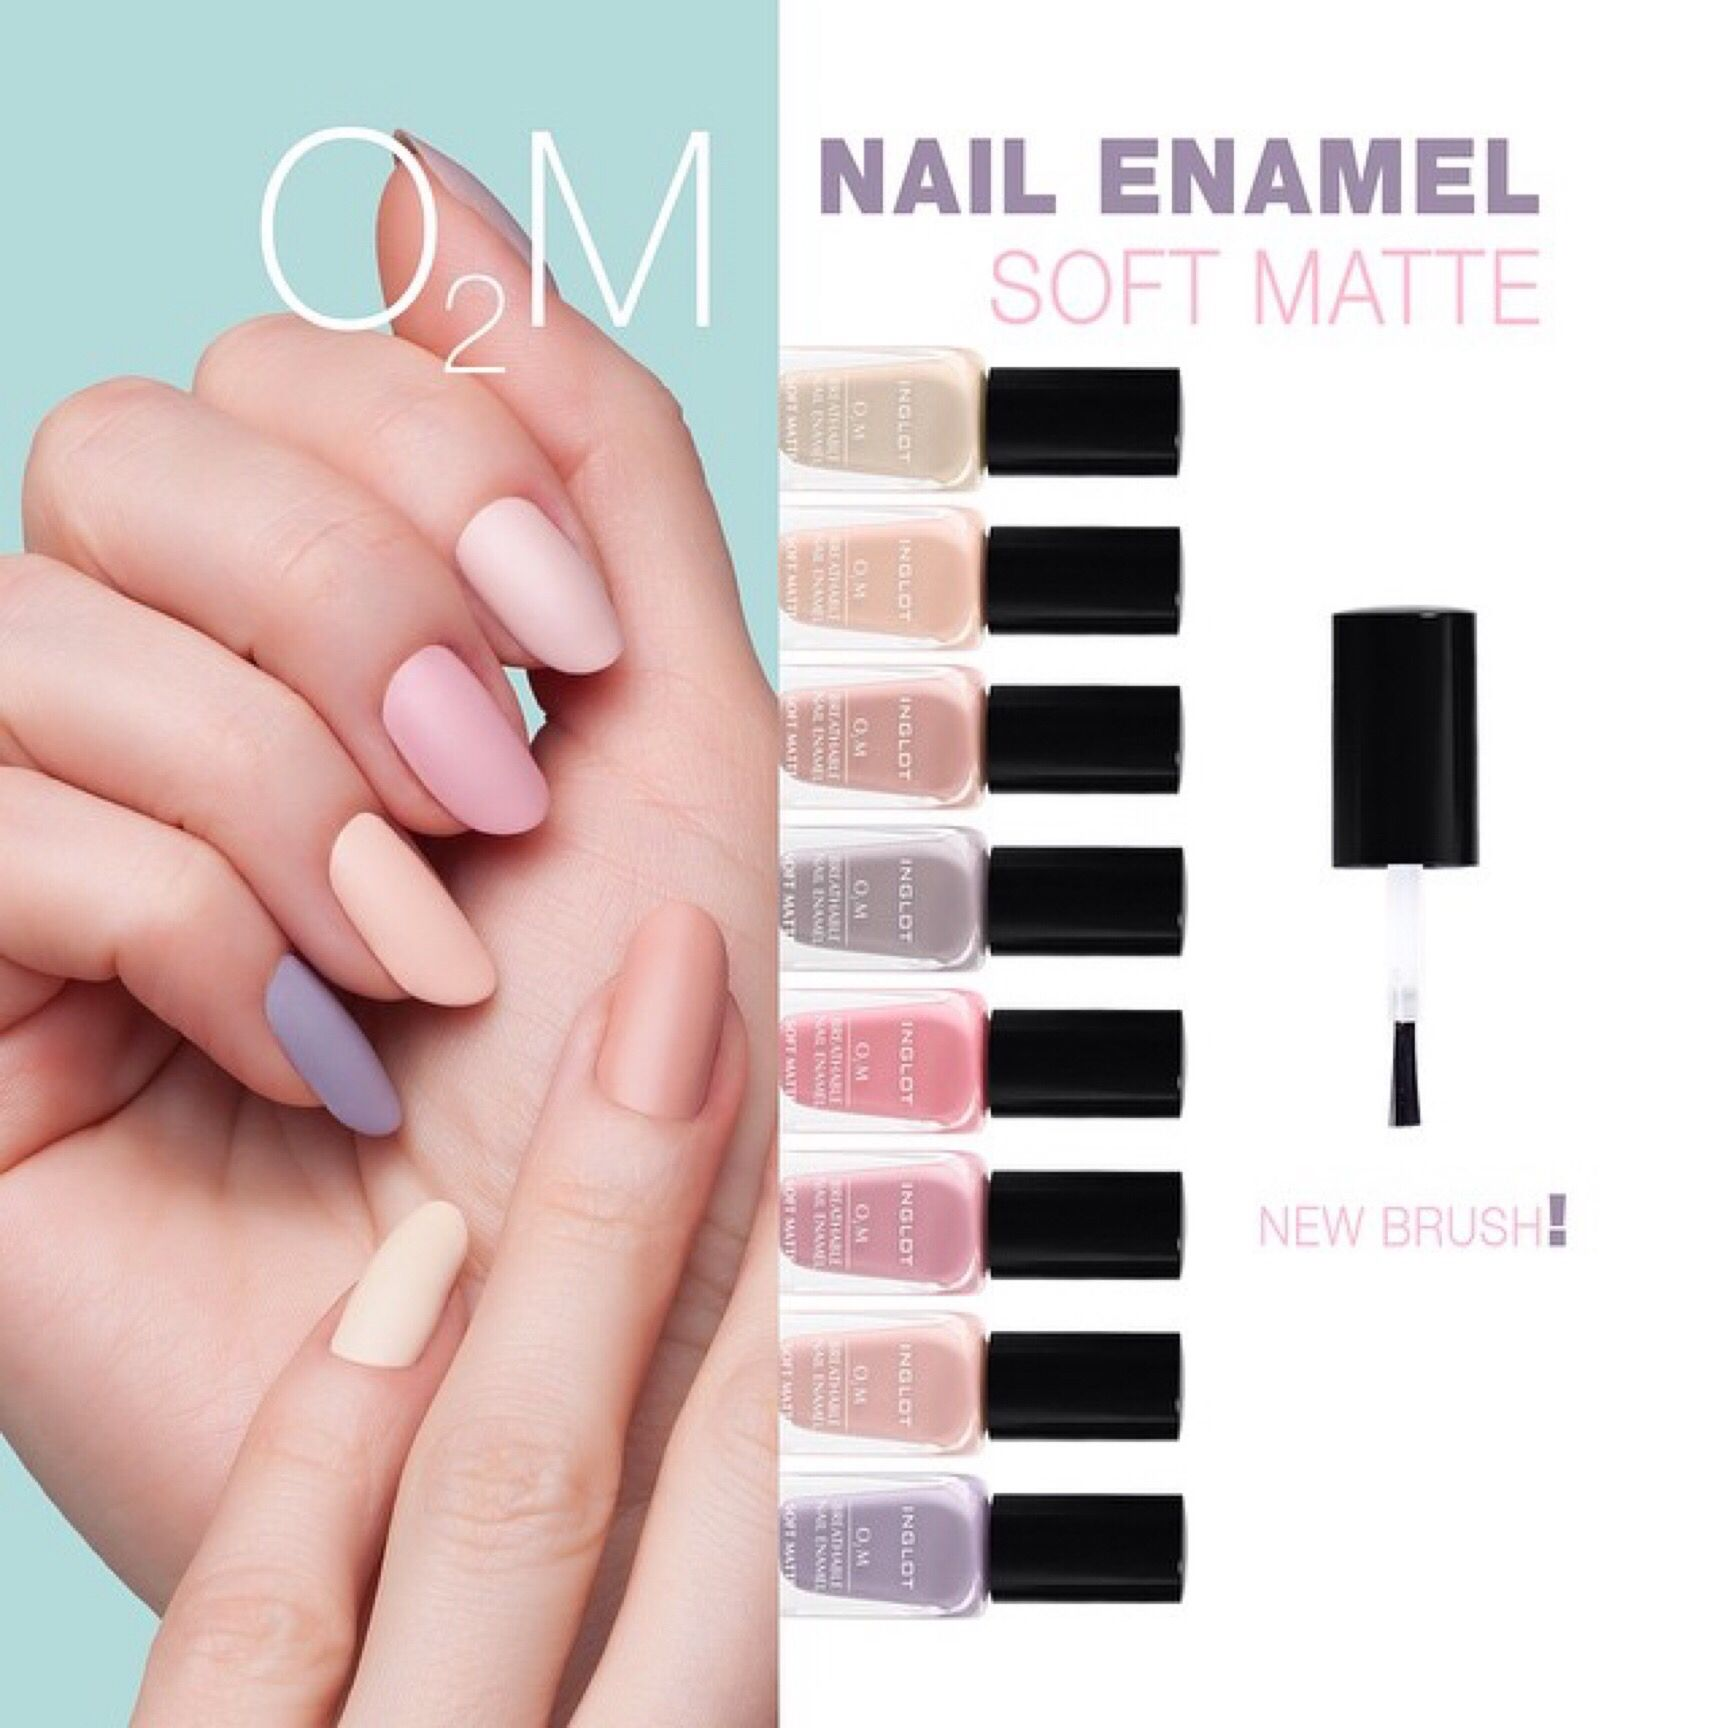 Inglot O2M soft matte | French Manicures | Pinterest | Pedi ...